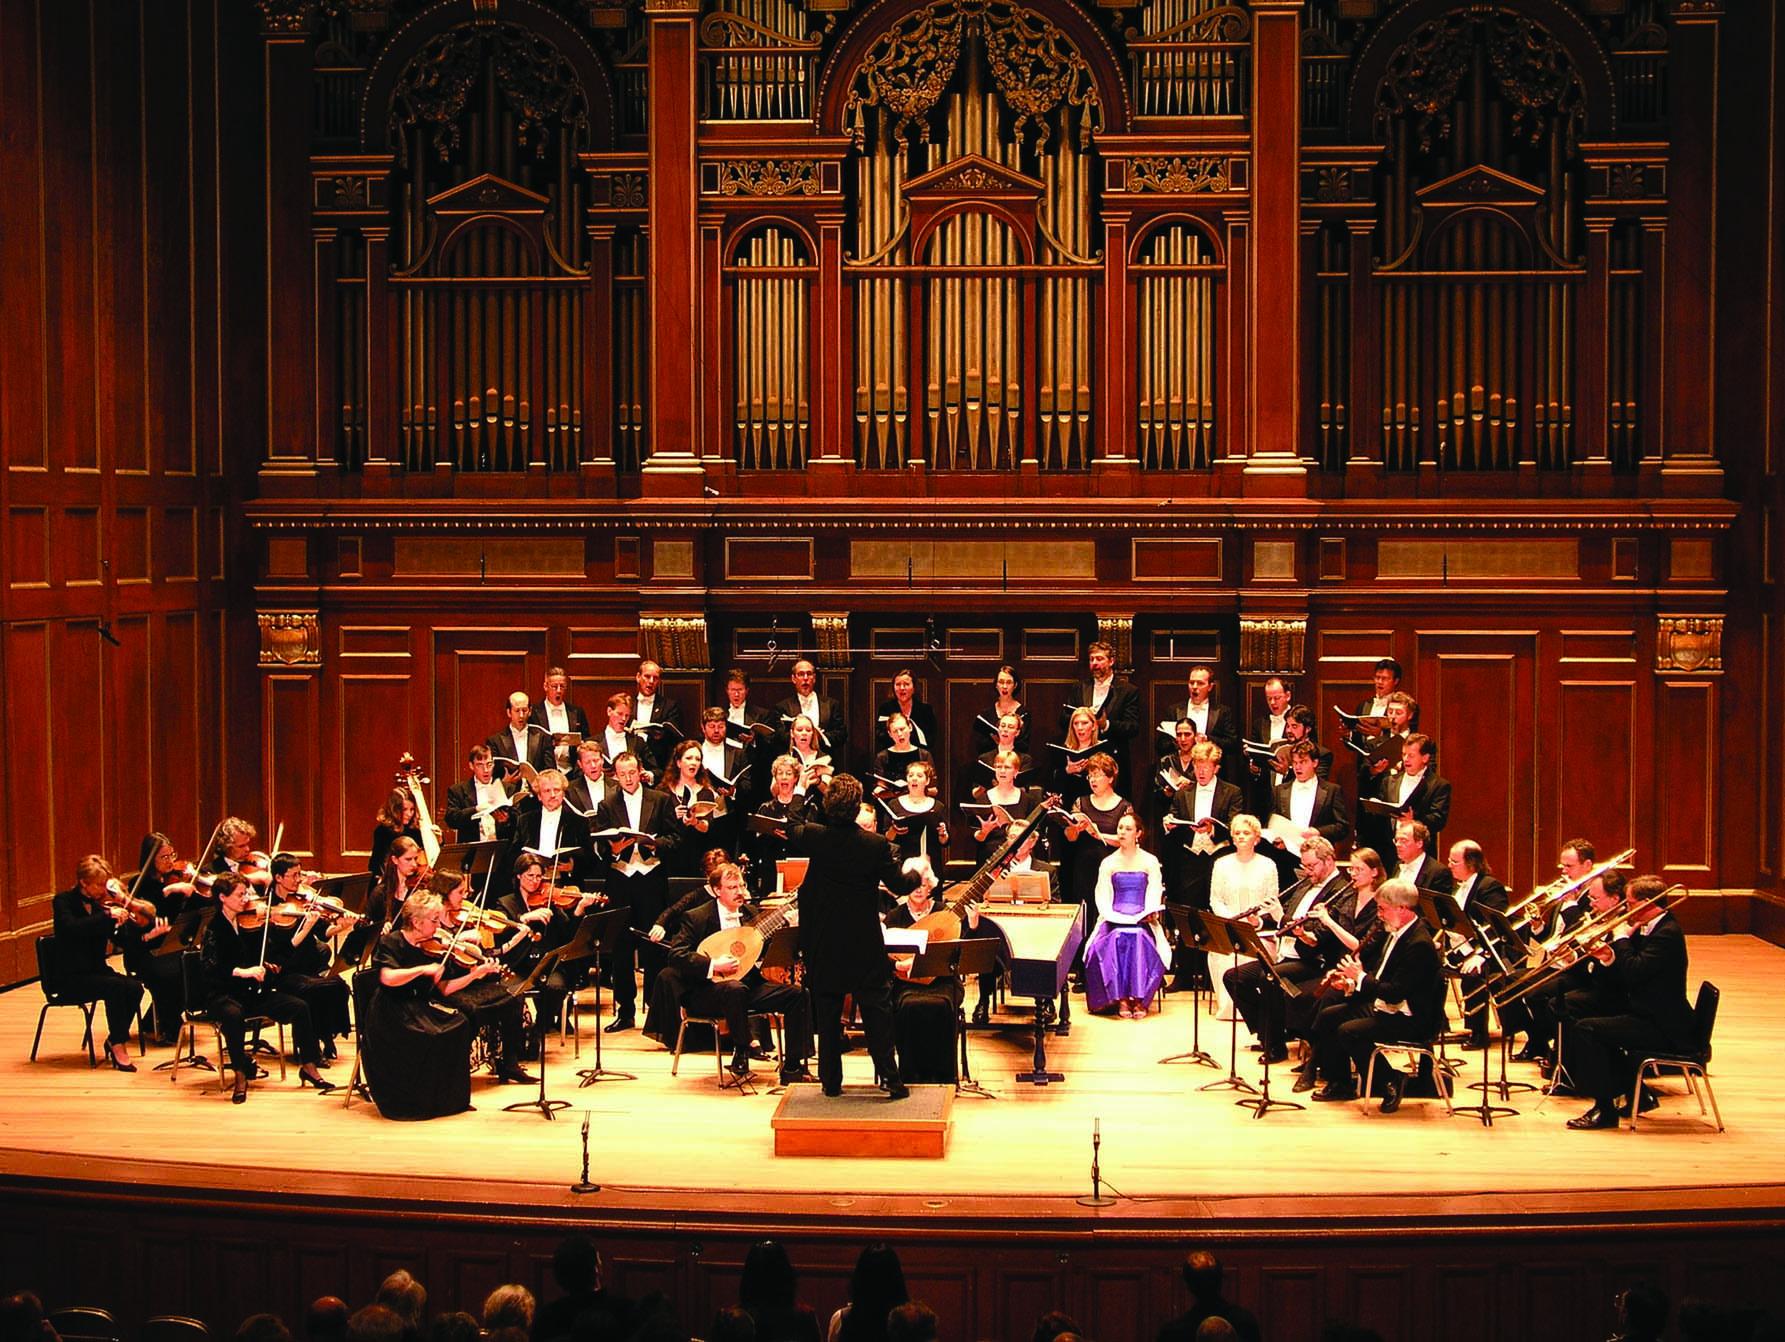 baroque oratorio - photo #4